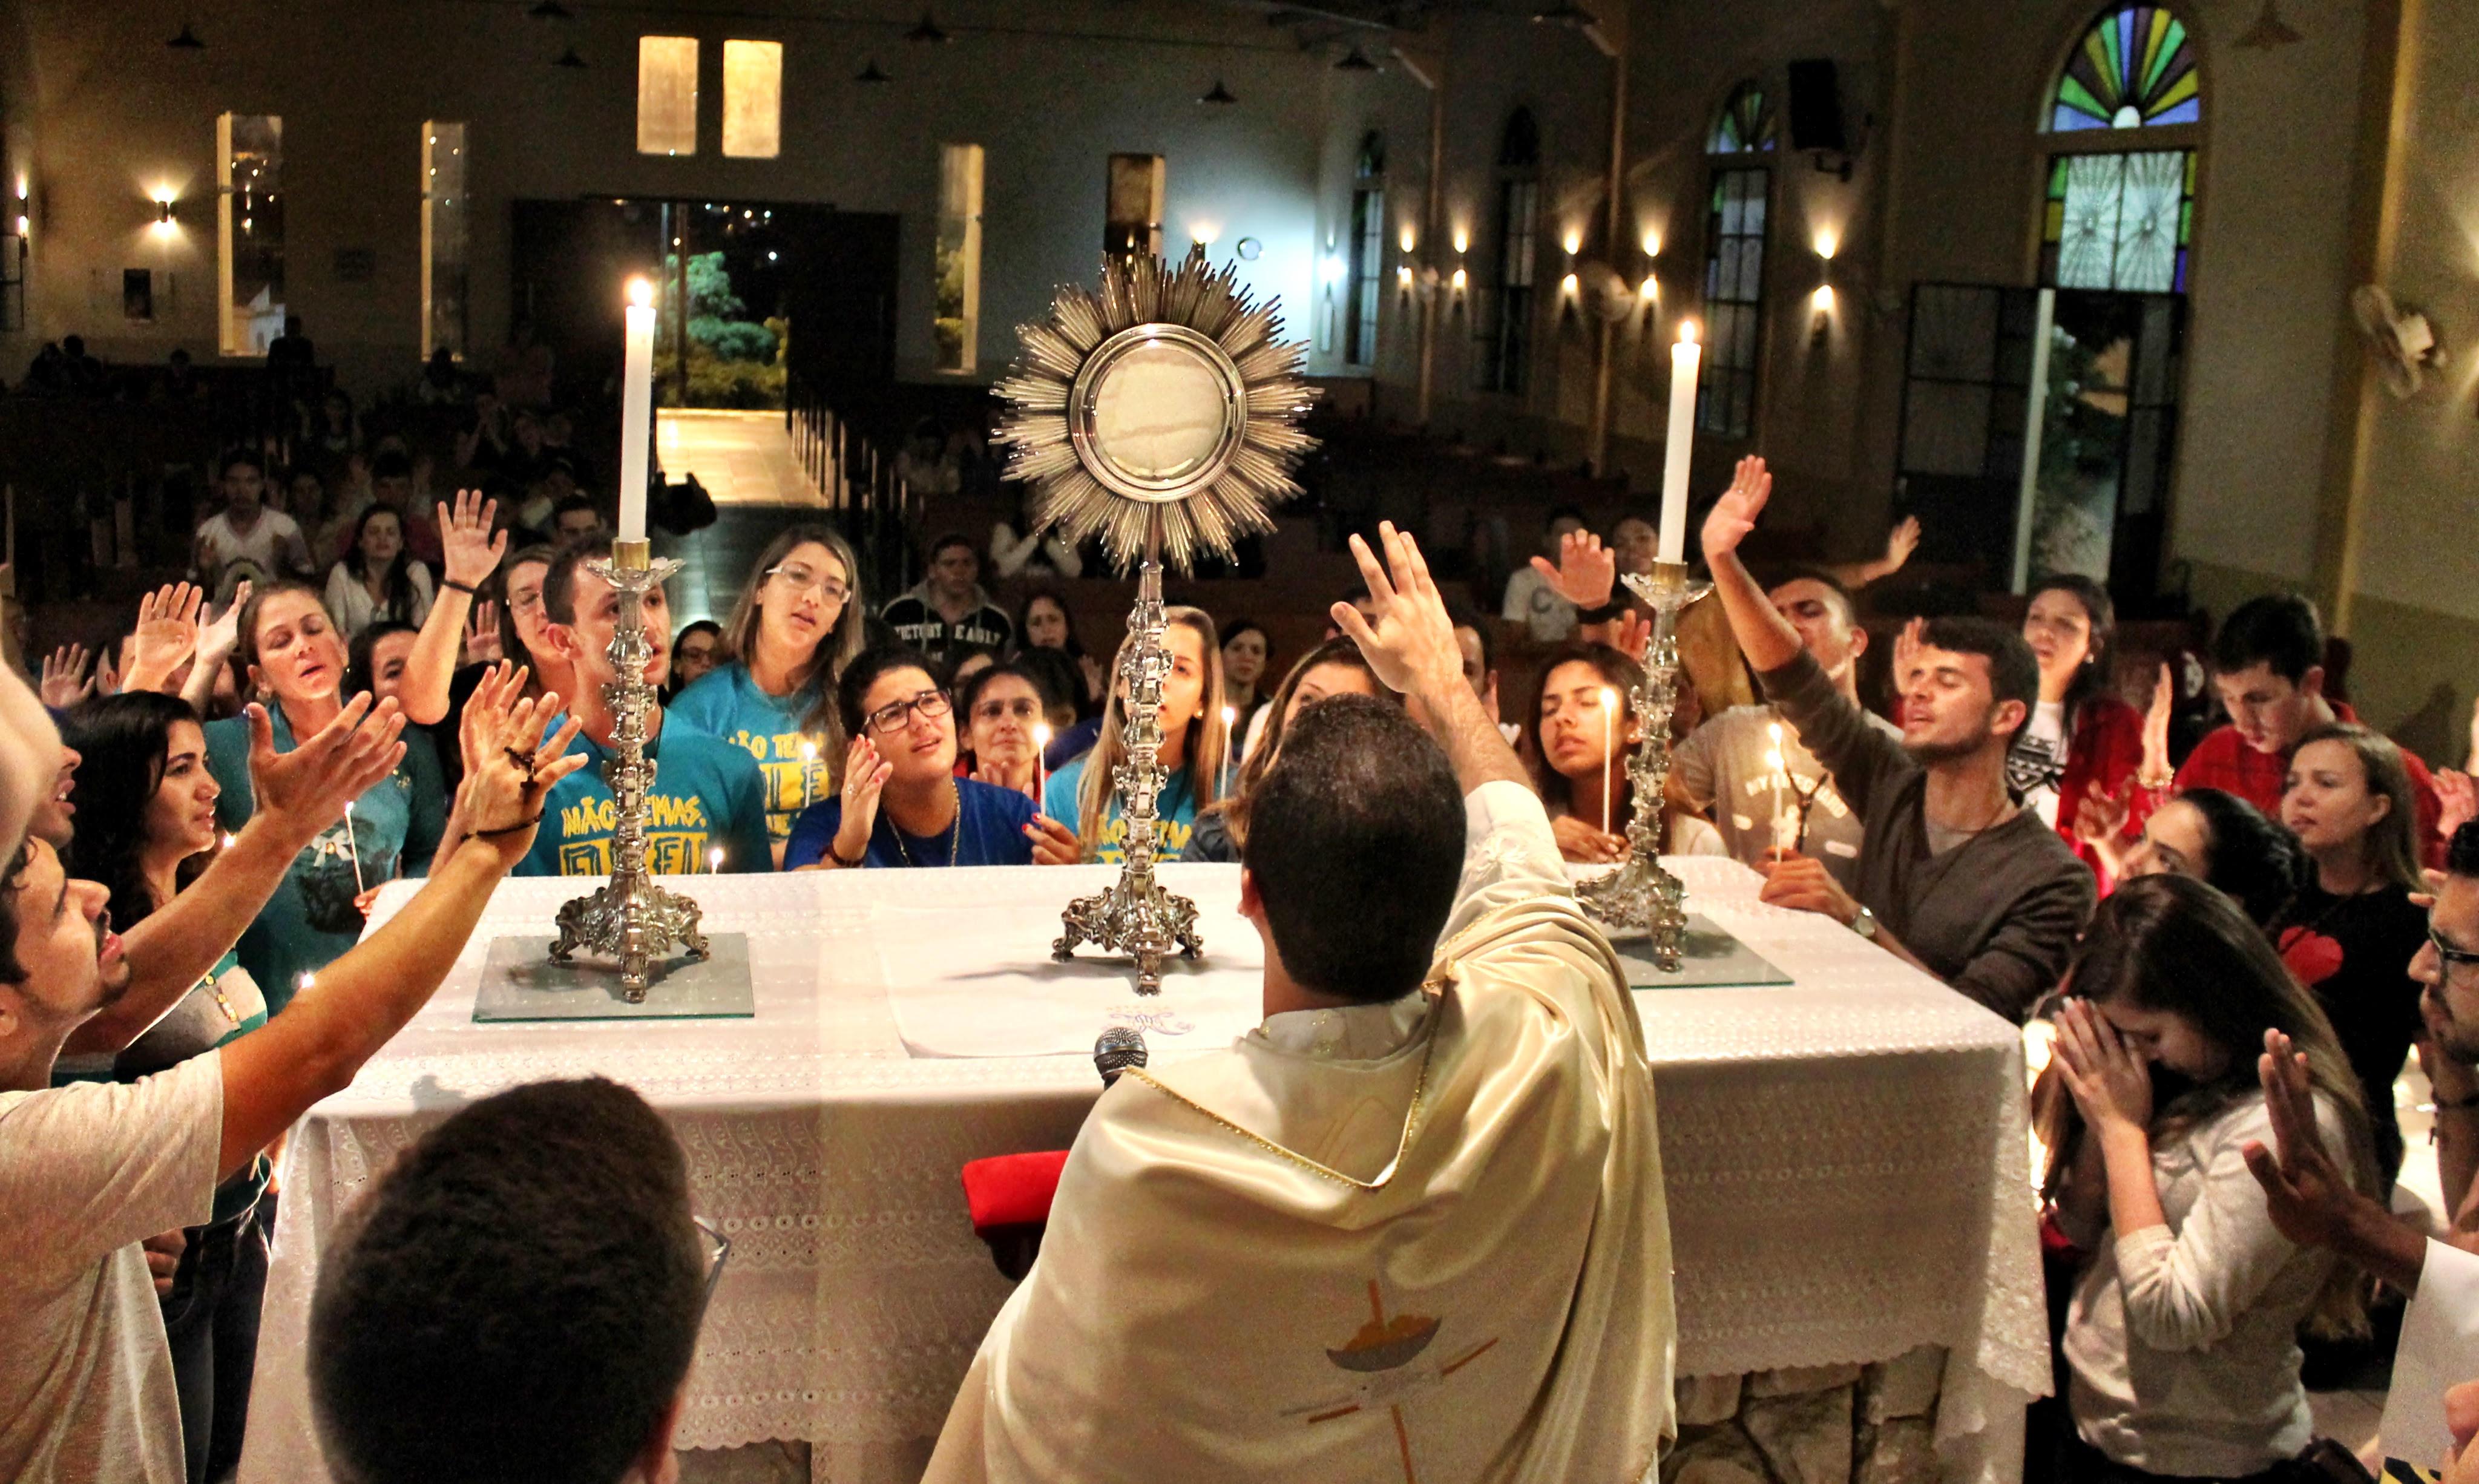 Para recordar JMJ, Diocese de Caruaru promove vigília